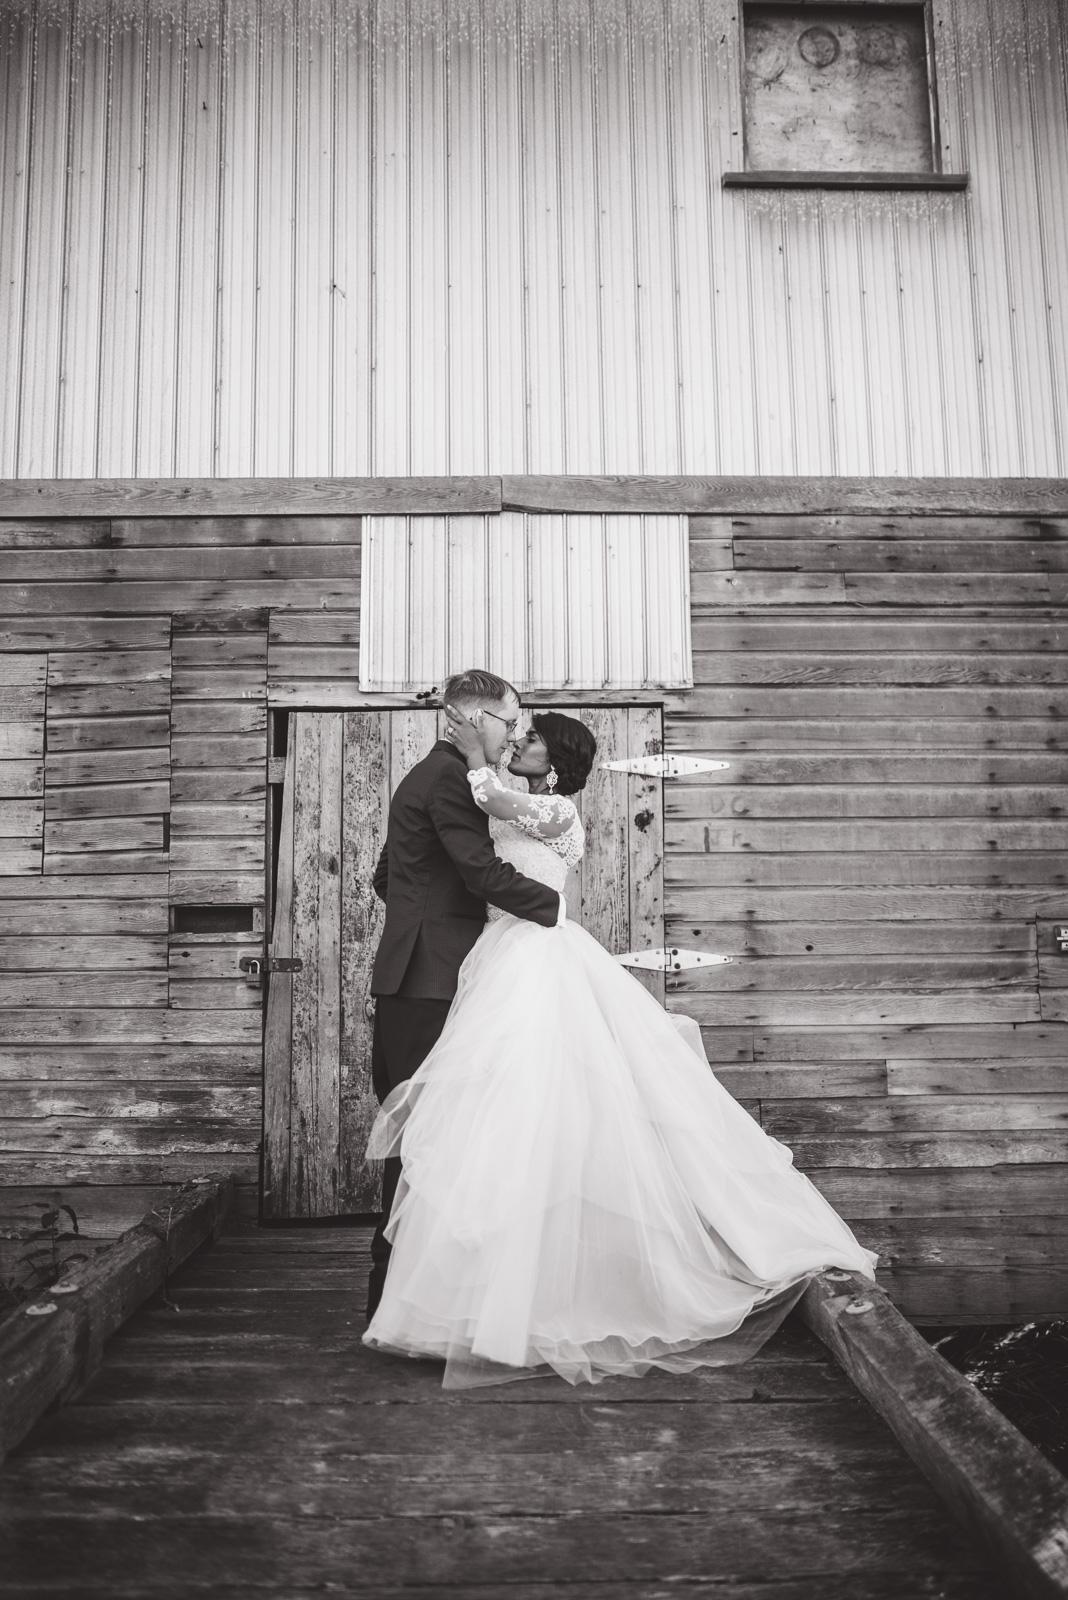 bc-wedding-photographers-paradise-banquet-hall-wedding-23.jpg